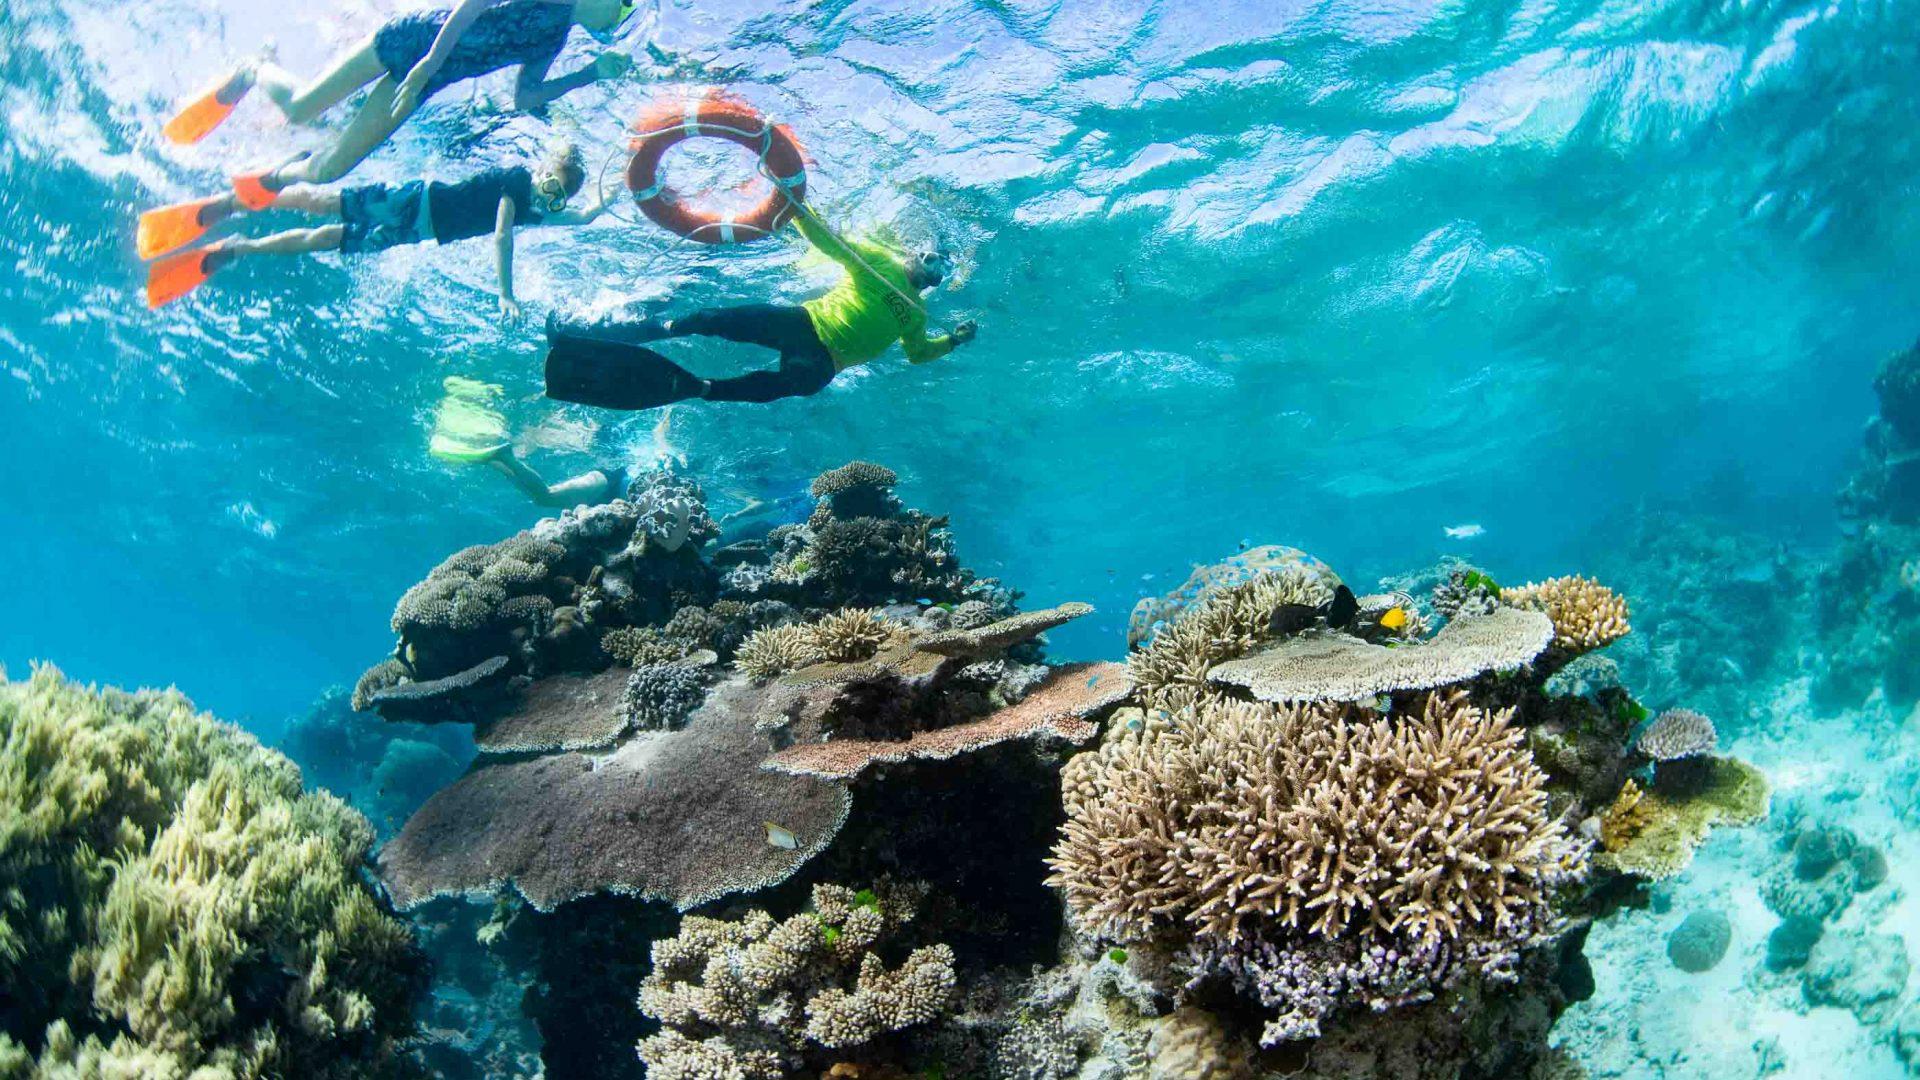 Snorkelers seen from below turquoise water.